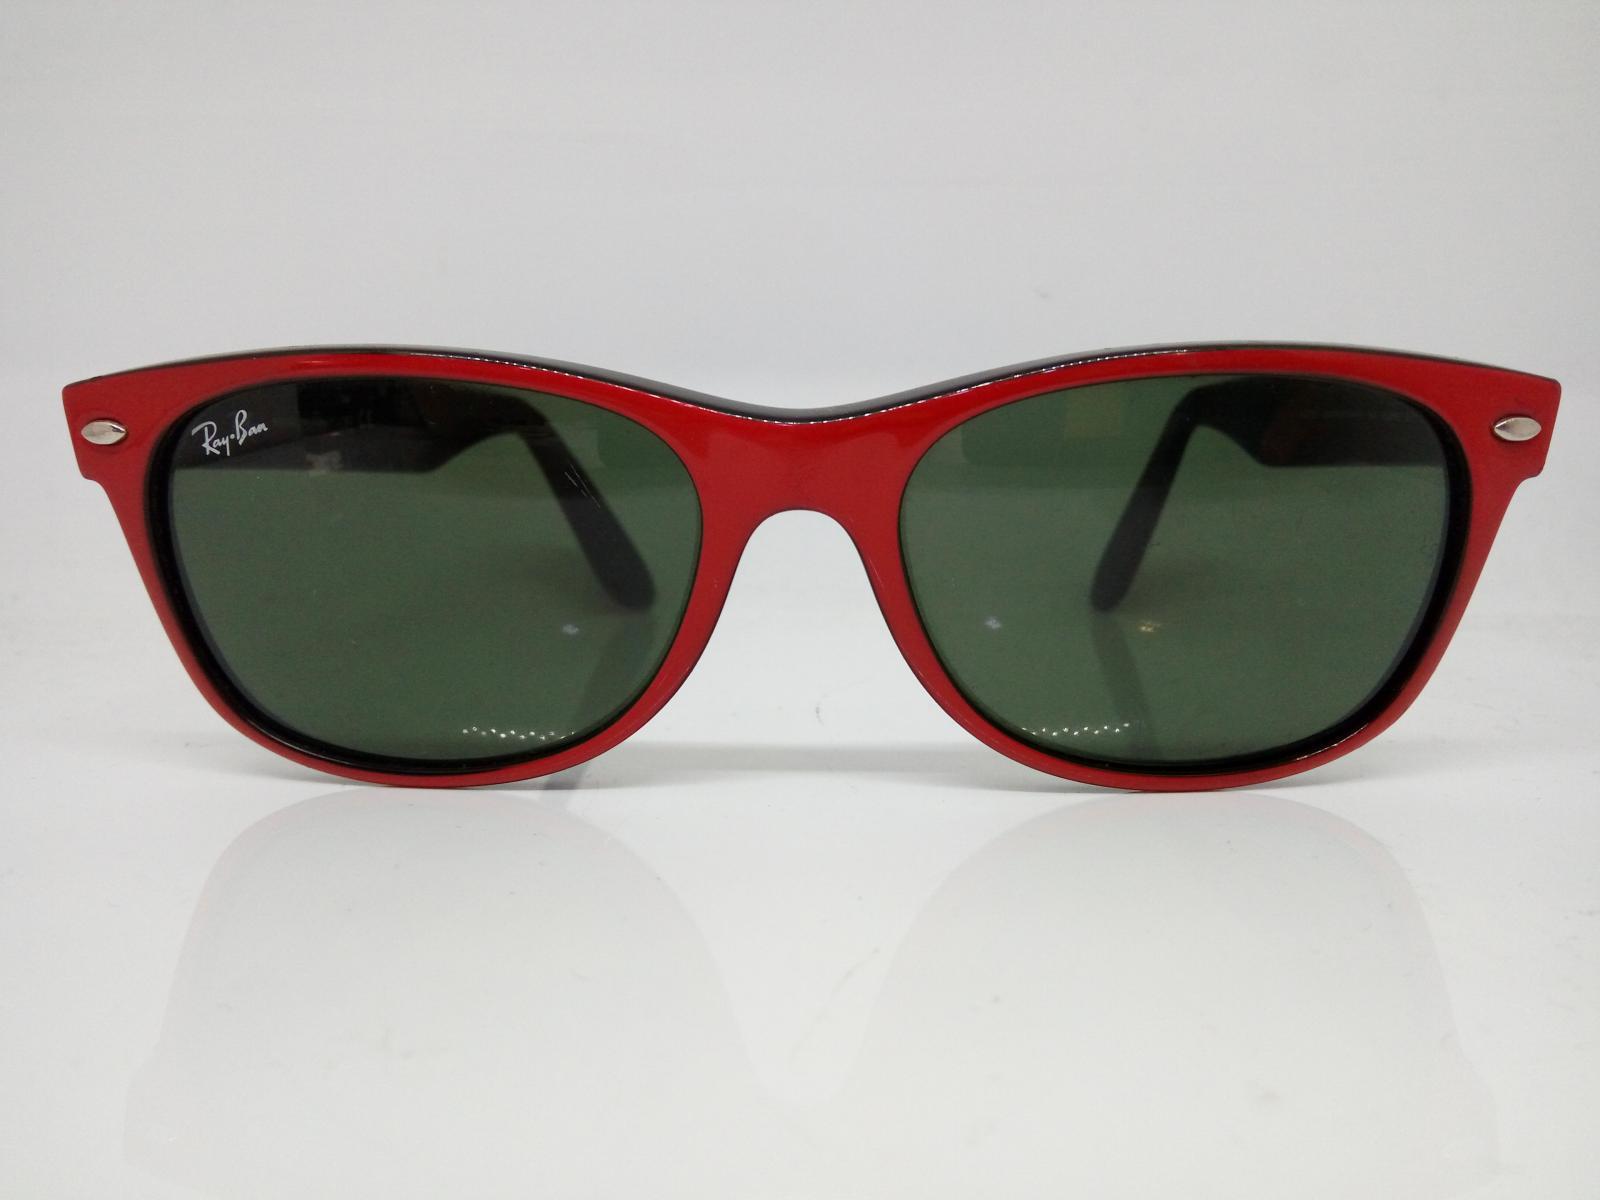 Gafas de Sol Rayban New Wayfarer RB2132 873 77 B 3a90783f4240